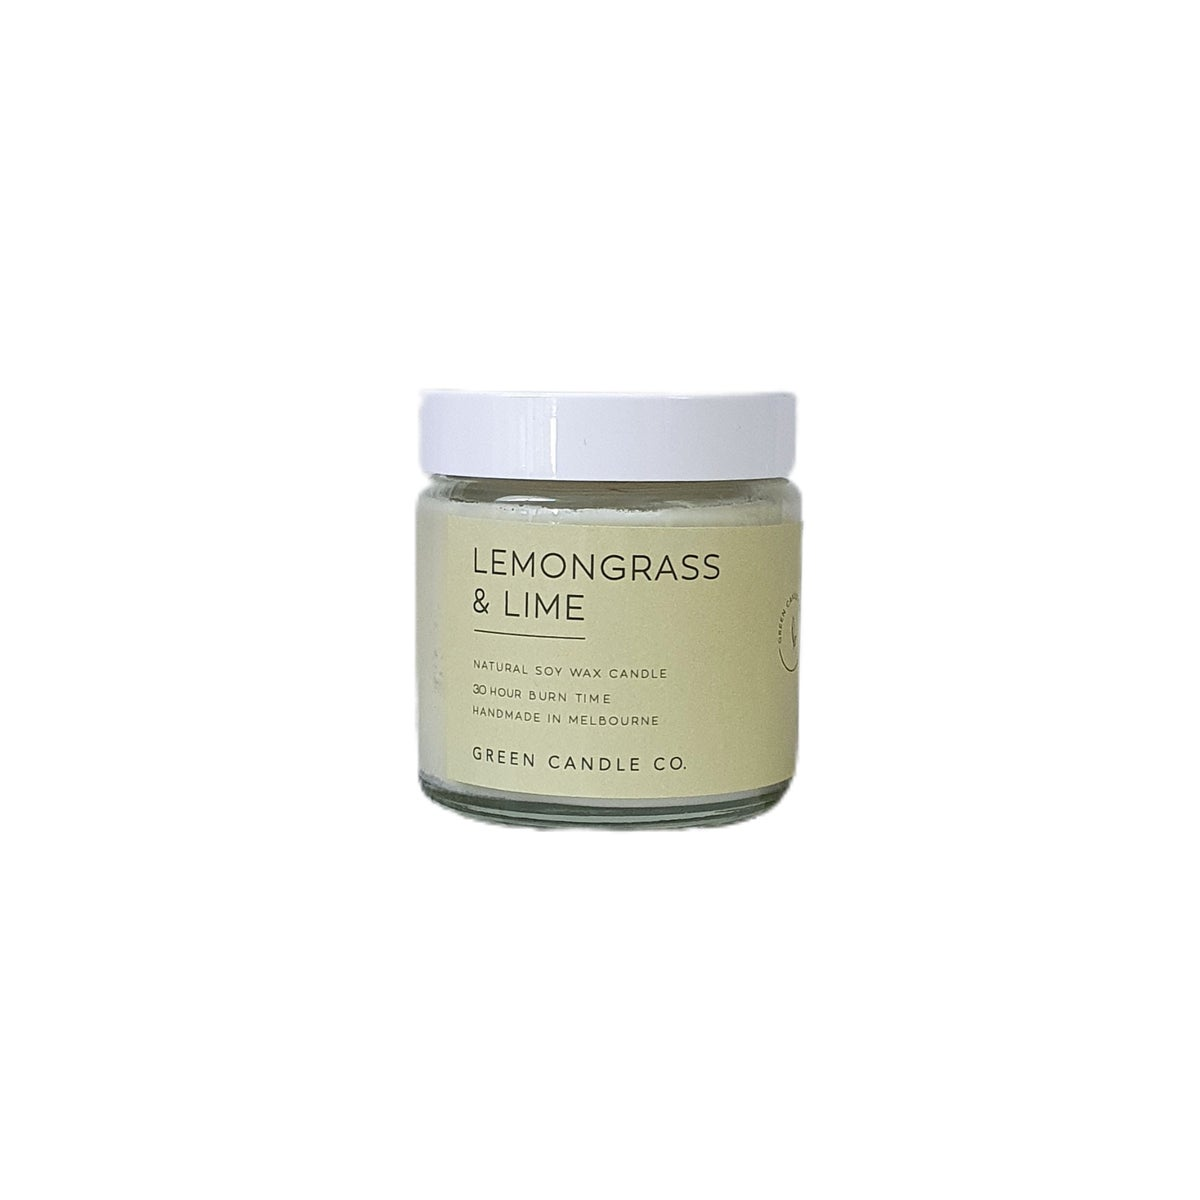 Image of LEMONGRASS & LIME Candle / Small